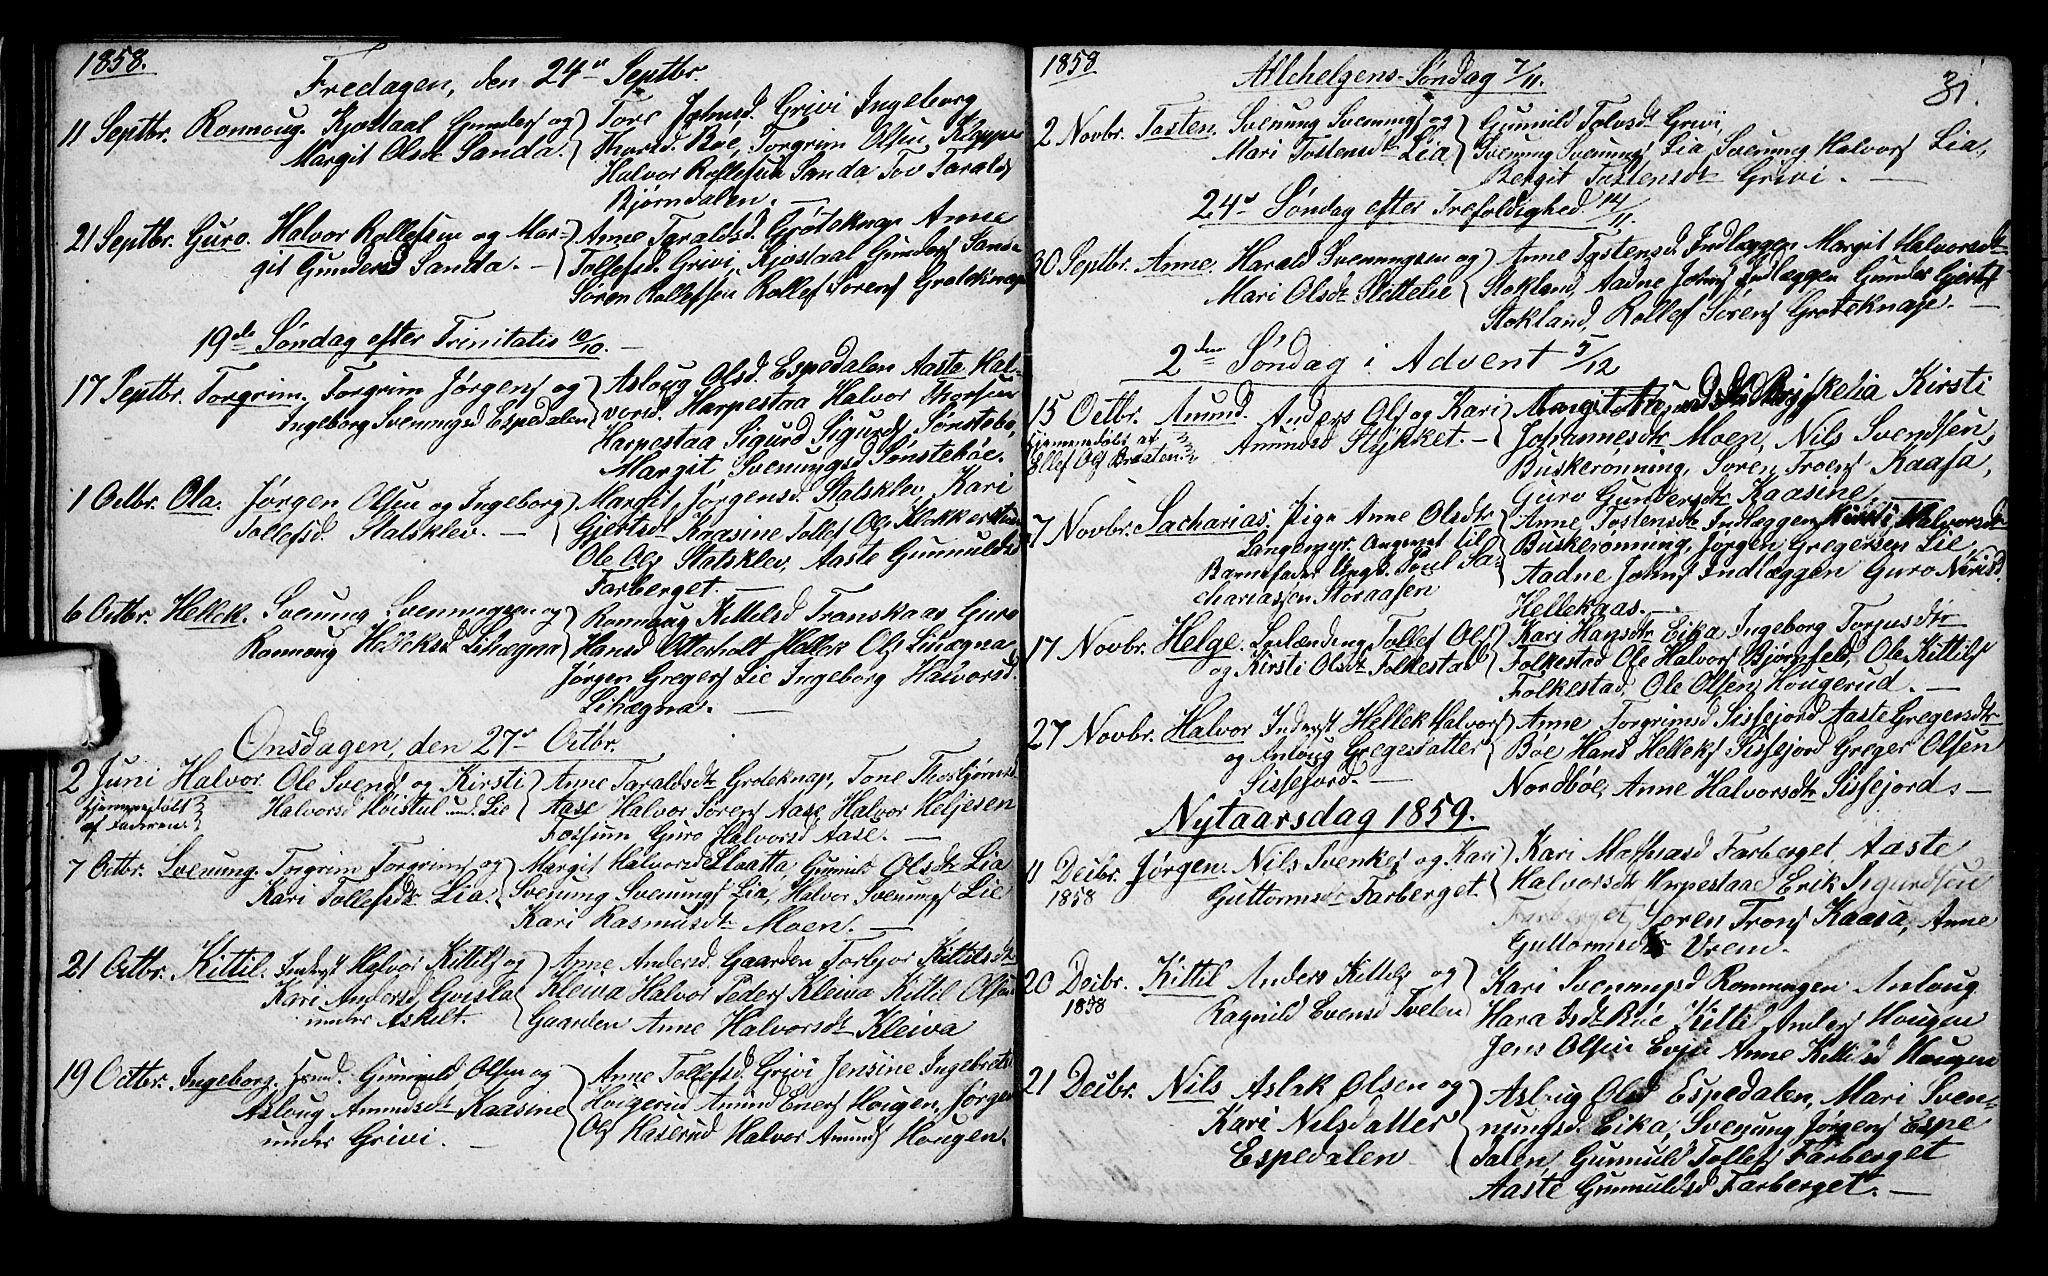 SAKO, Bø kirkebøker, G/Ga/L0002: Klokkerbok nr. 2, 1853-1866, s. 31